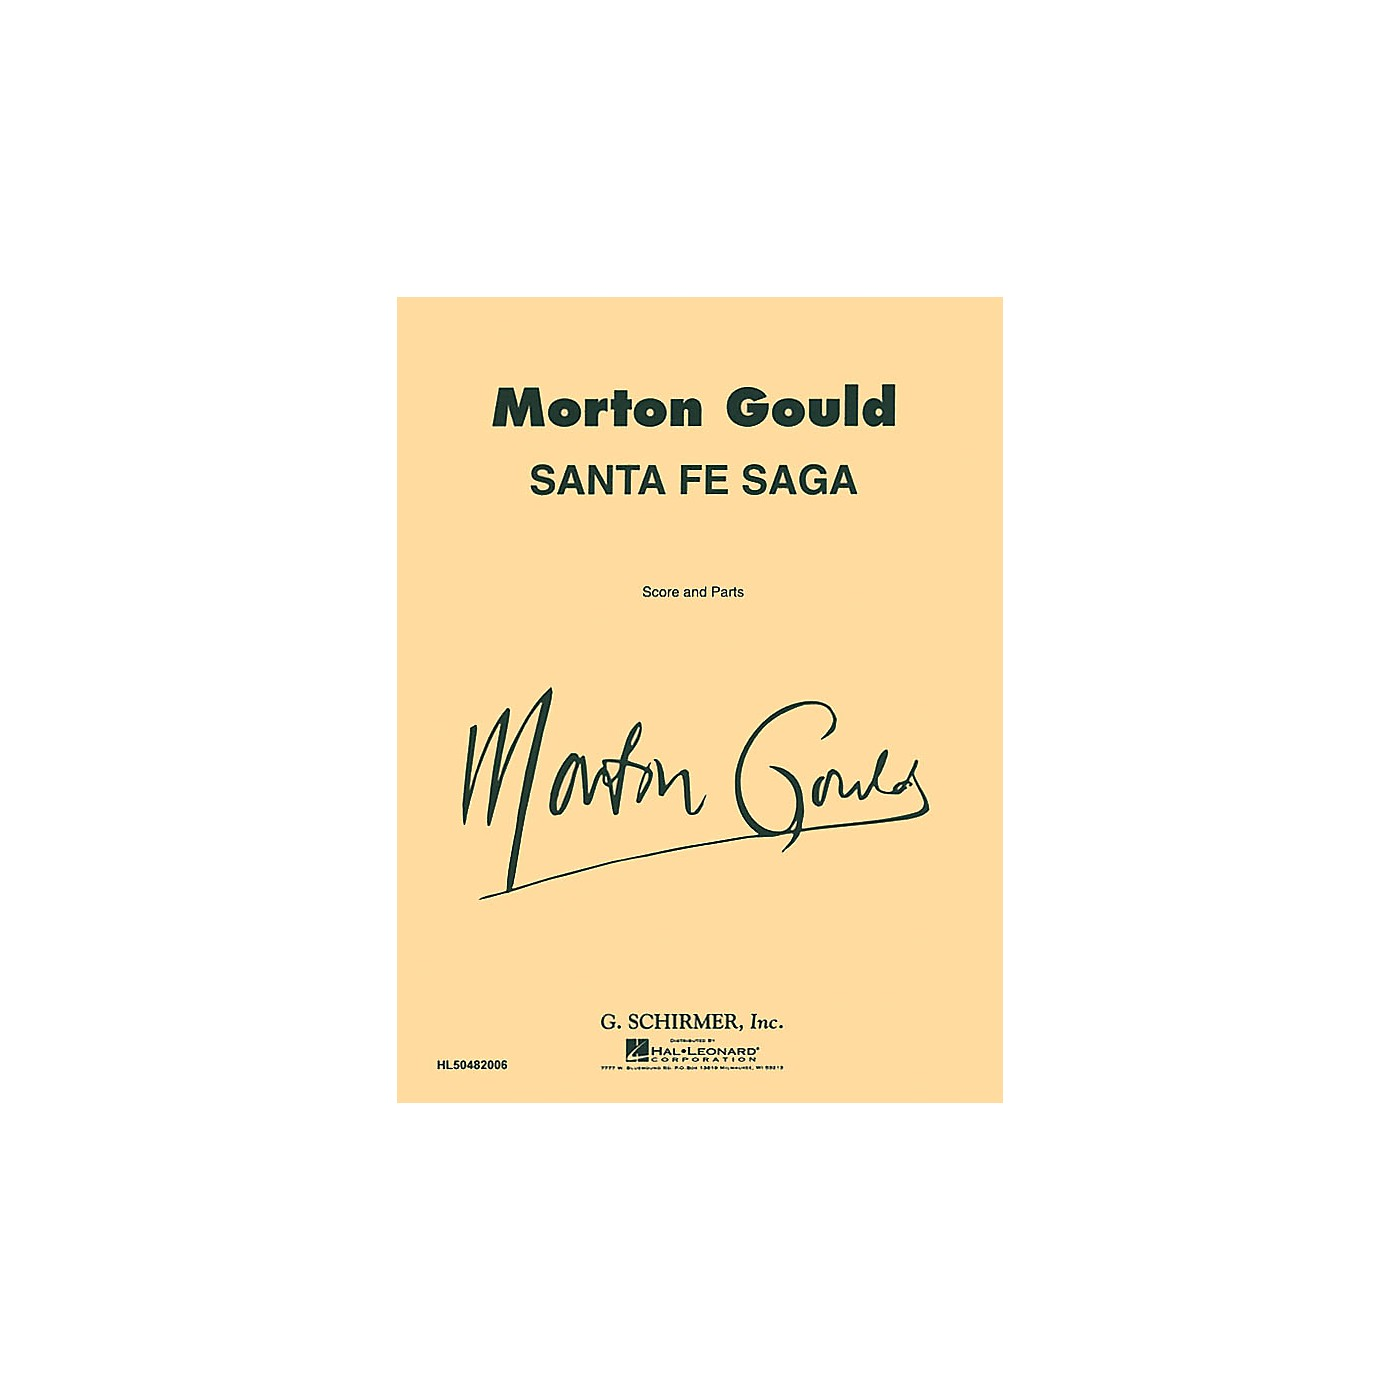 G. Schirmer Santa Fe Saga (Score and Parts) Concert Band Level 4-5 Composed by Morton Gould thumbnail